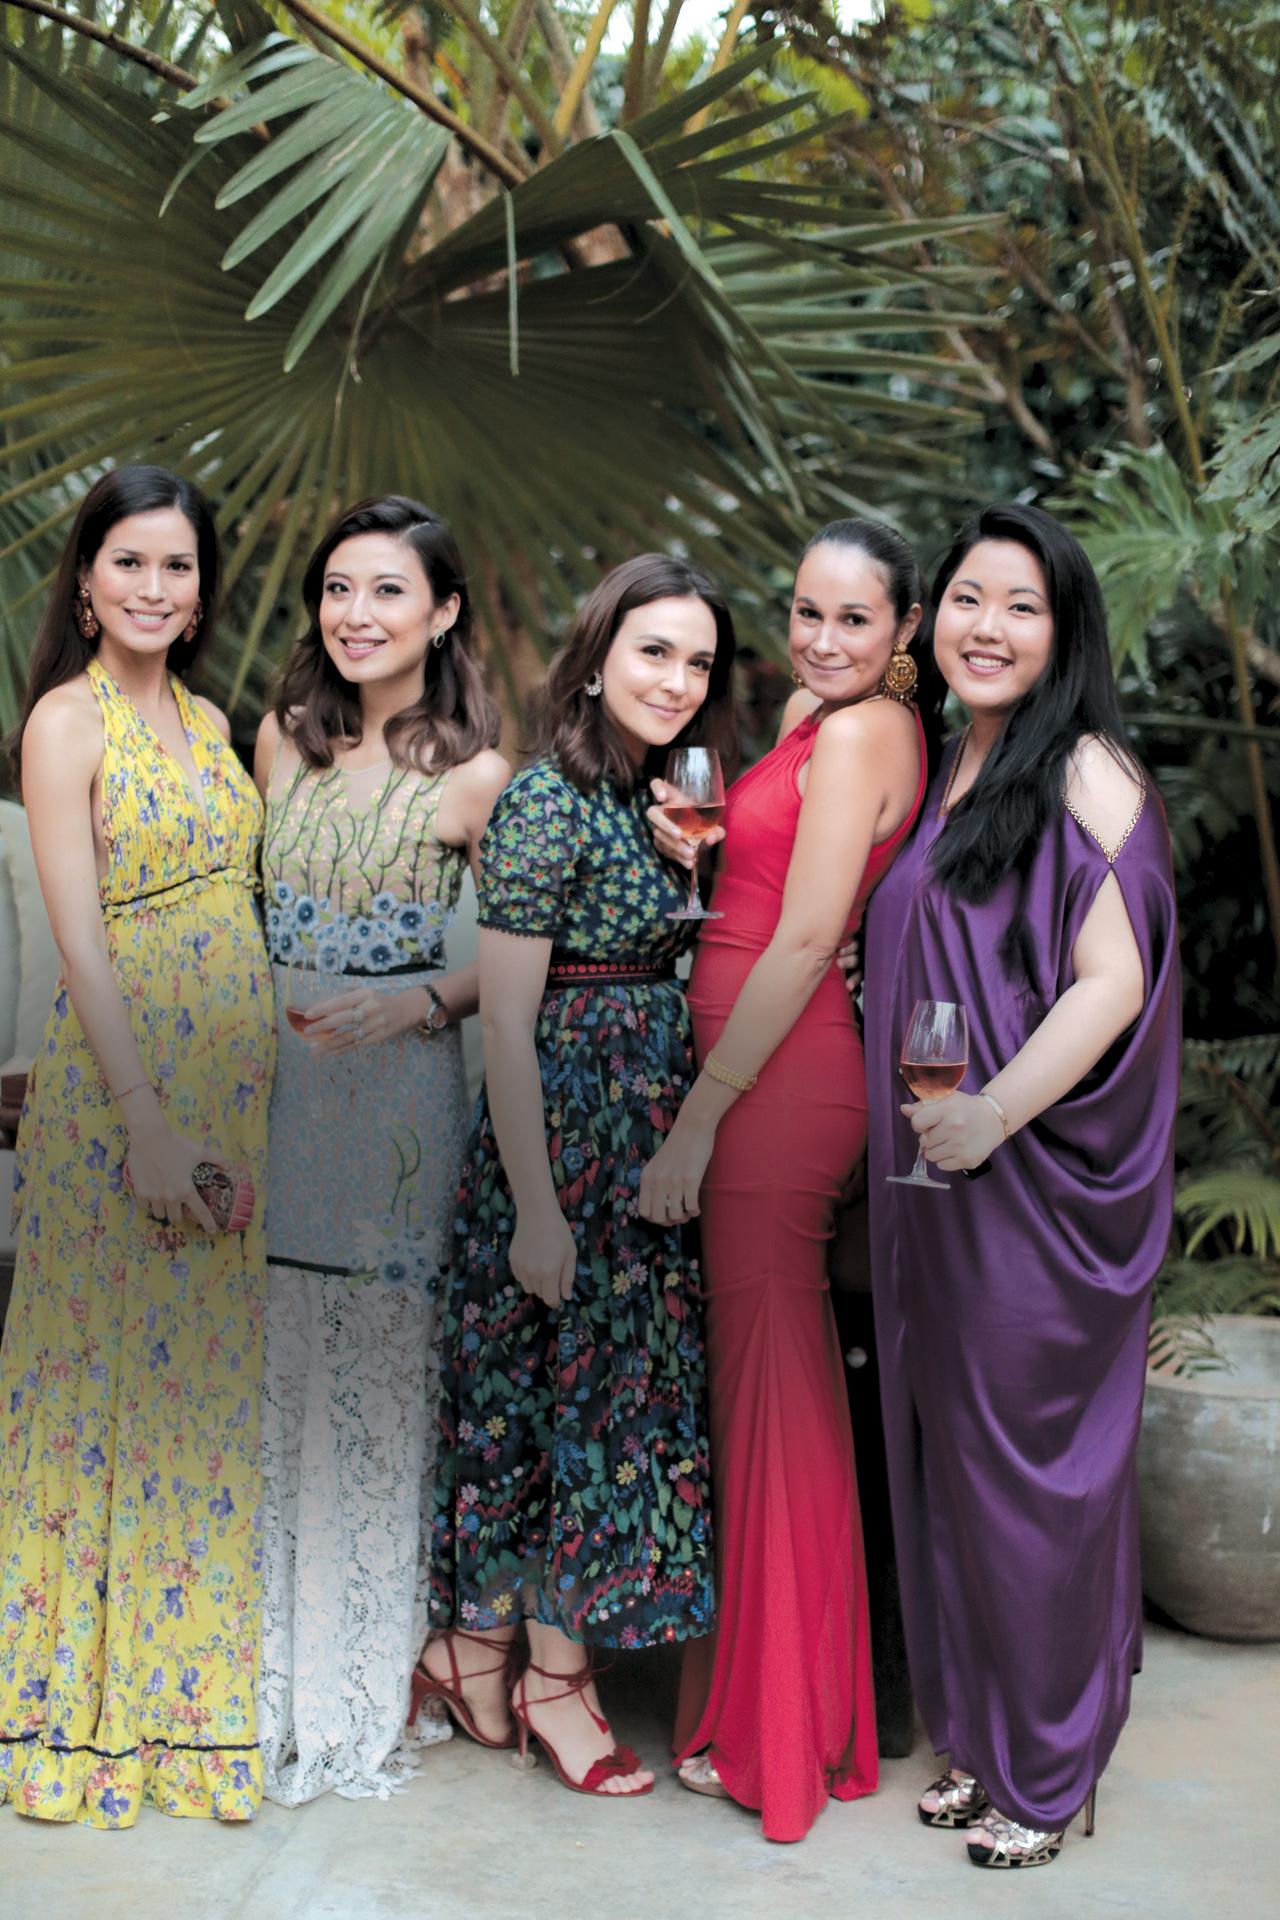 Jessica Kienle-Maxwell, Rossana Ocampo-Rodriguez, Sandra Peña Paradies, Georgia Schulze del Rosario, Isabel Martel Francisco